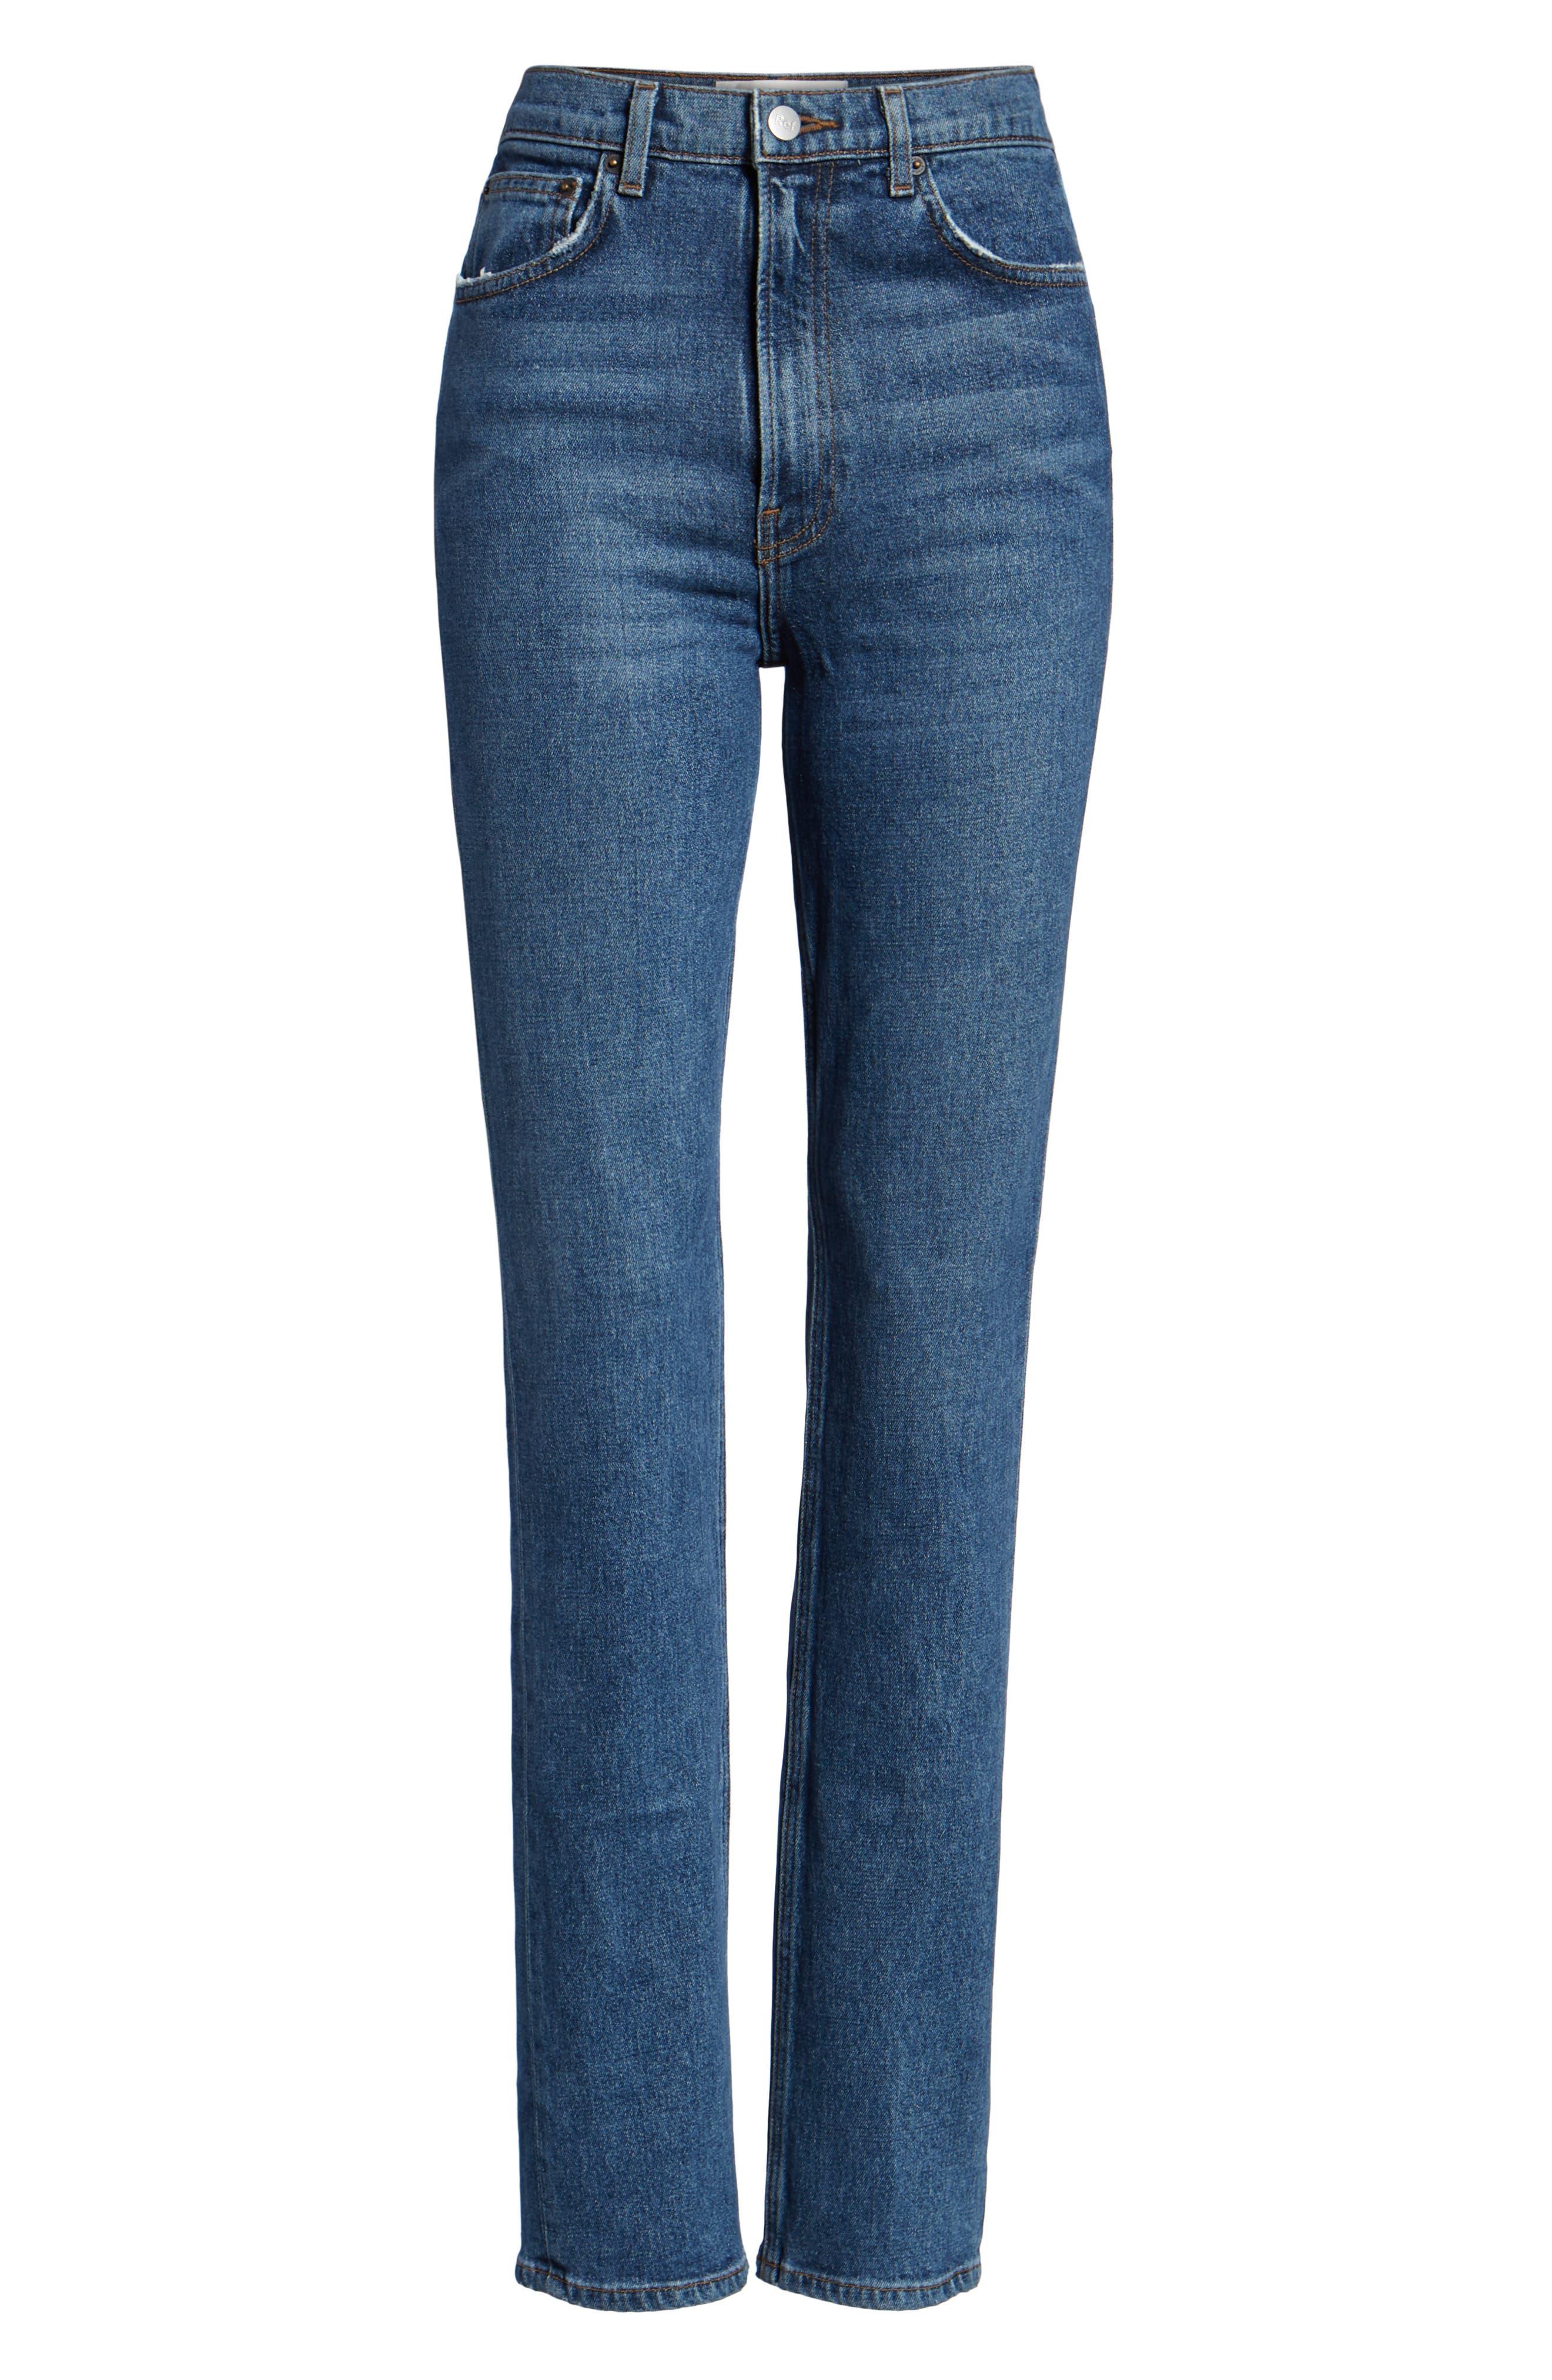 Liza High Waist Straight Leg Jeans,                             Alternate thumbnail 3, color,                             KASAI